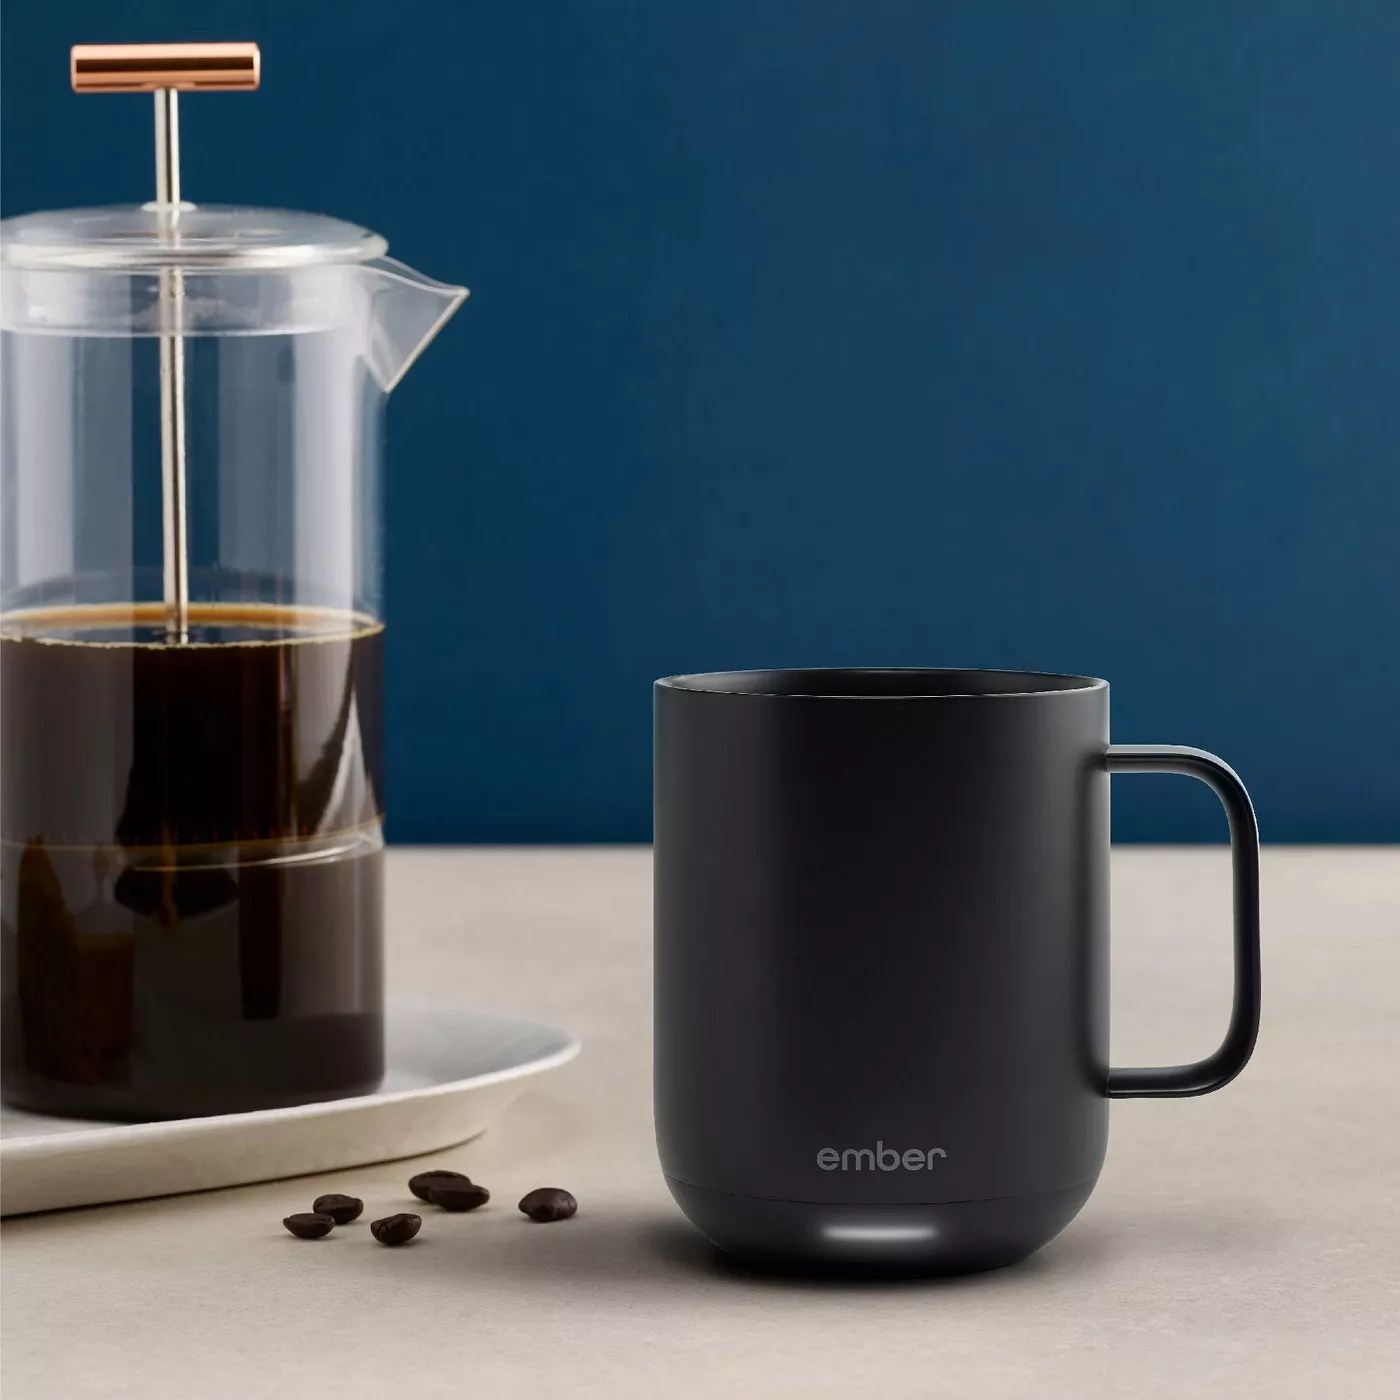 The mug with a sensor on the bottom on a kitchen counter